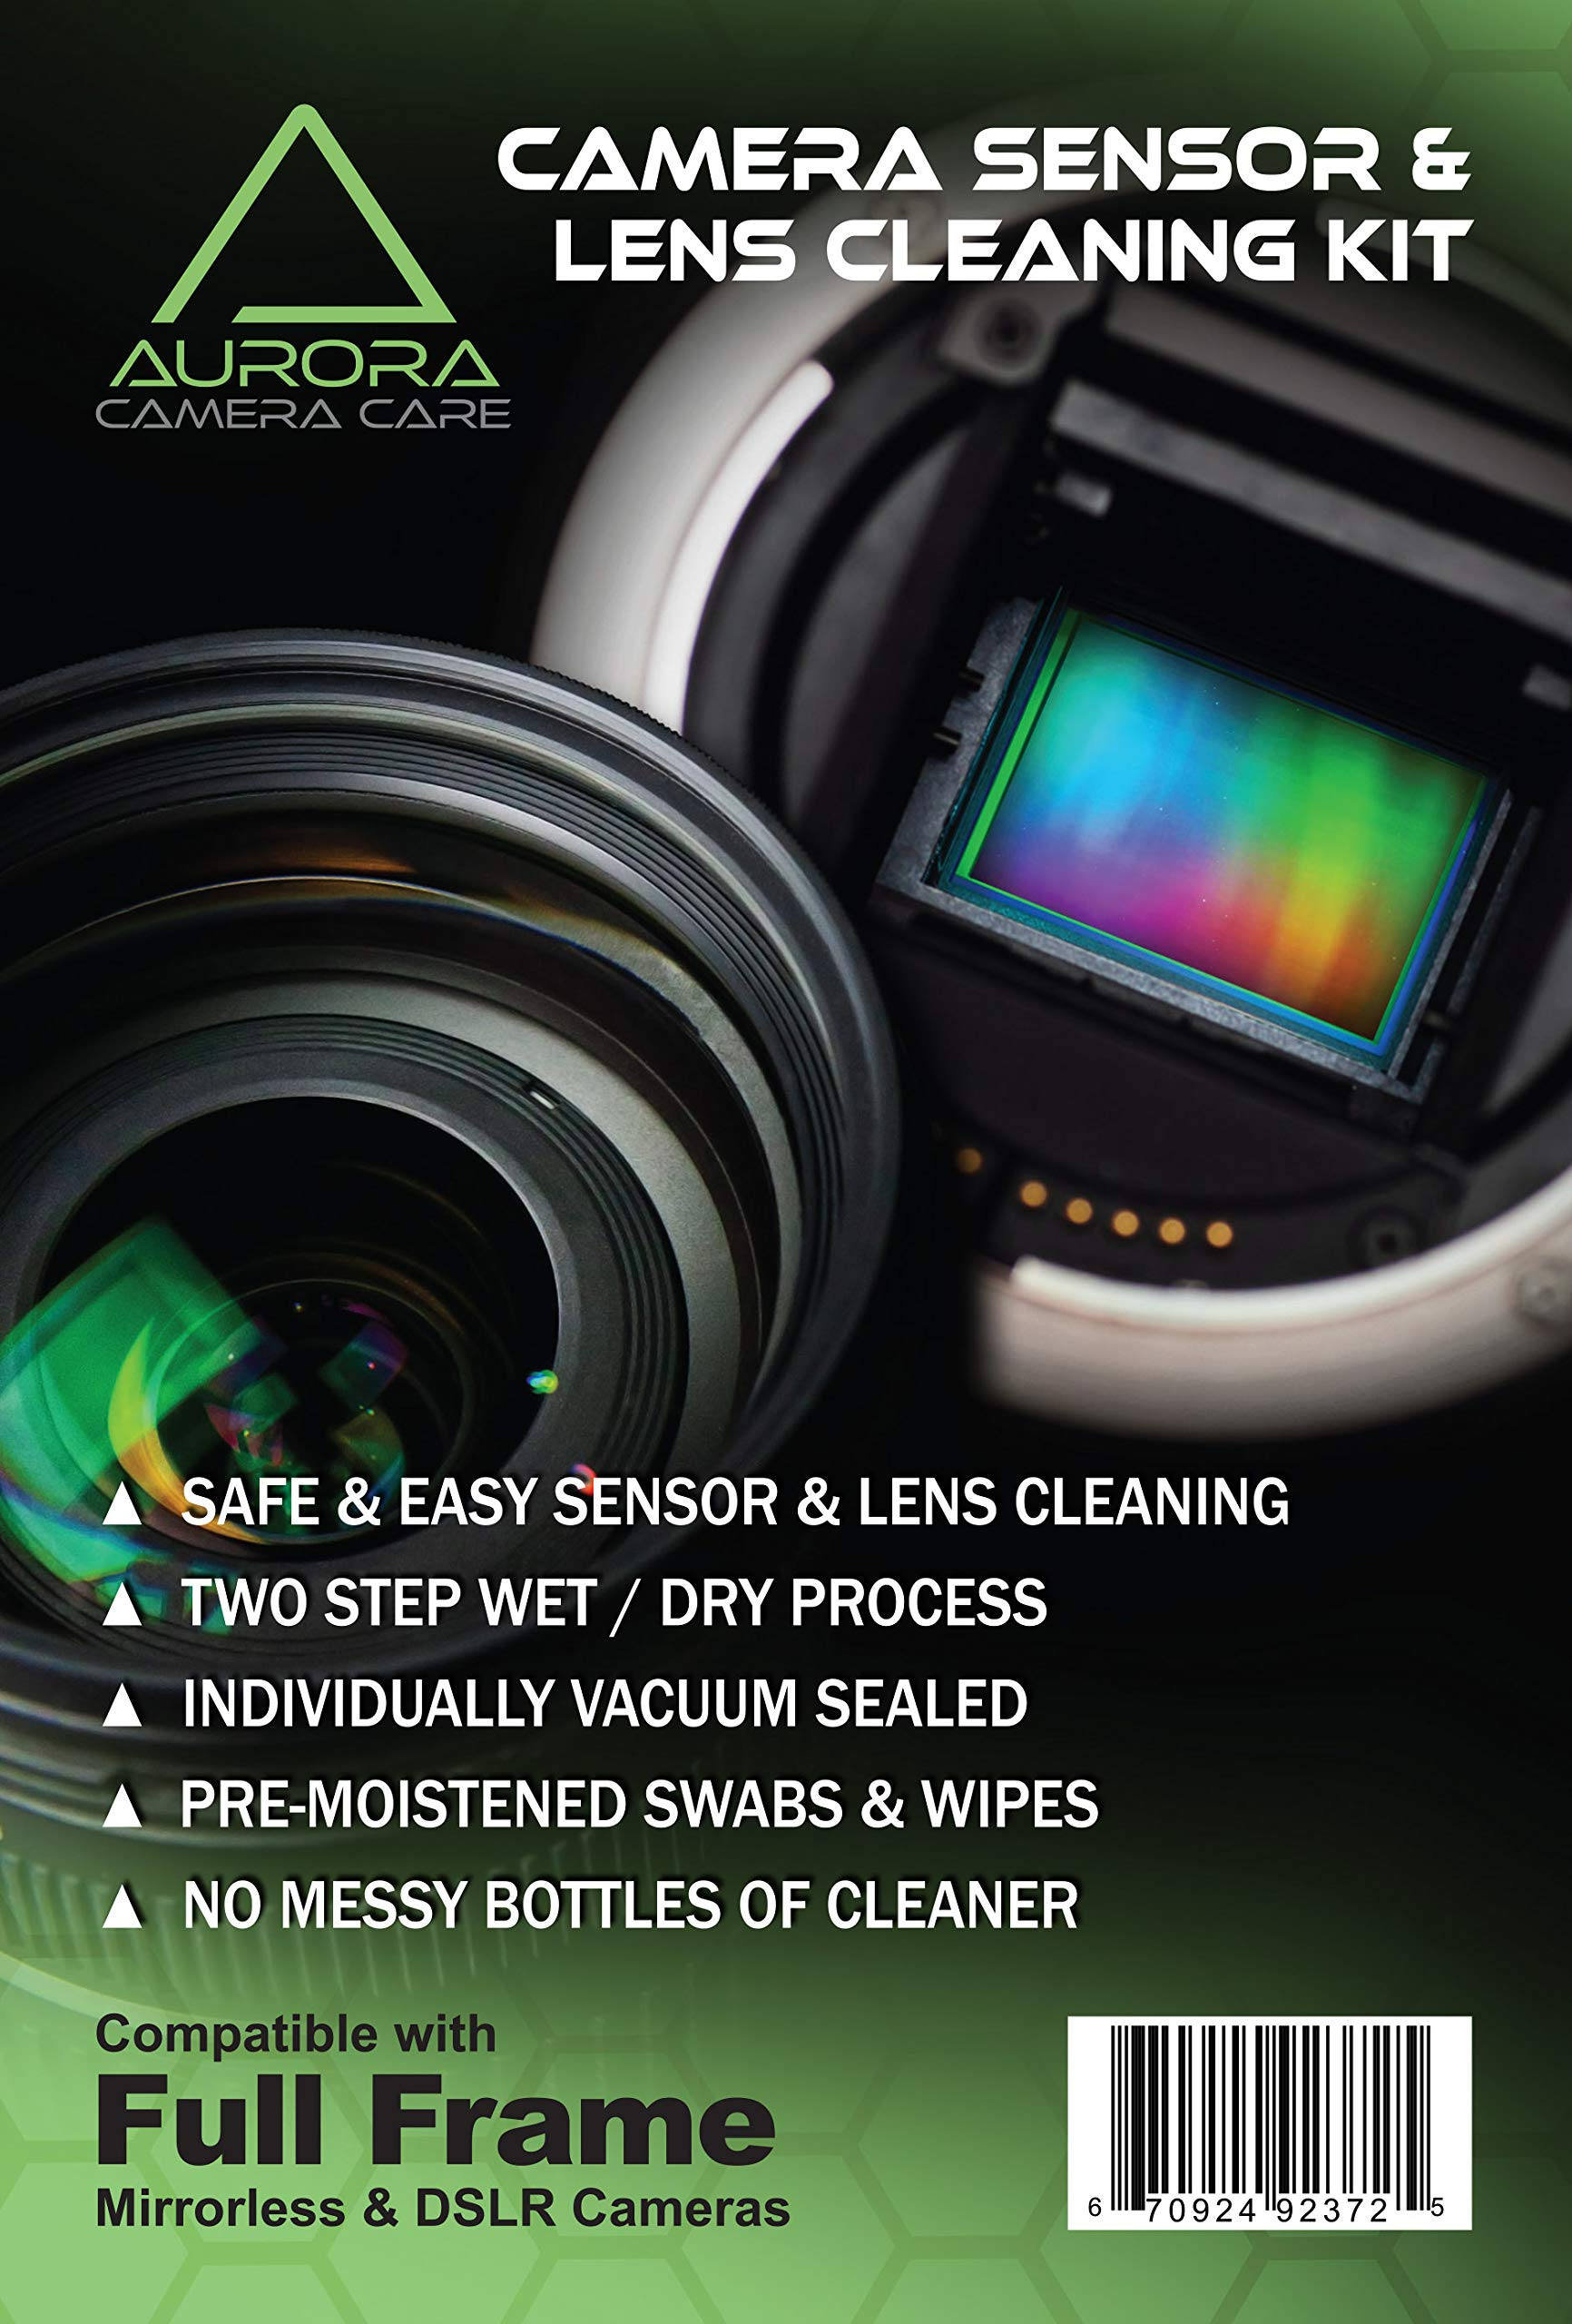 Aurora Camera Care Camera Sensor & Lens Cleaning Kits (Full Frame) by Aurora Camera Care